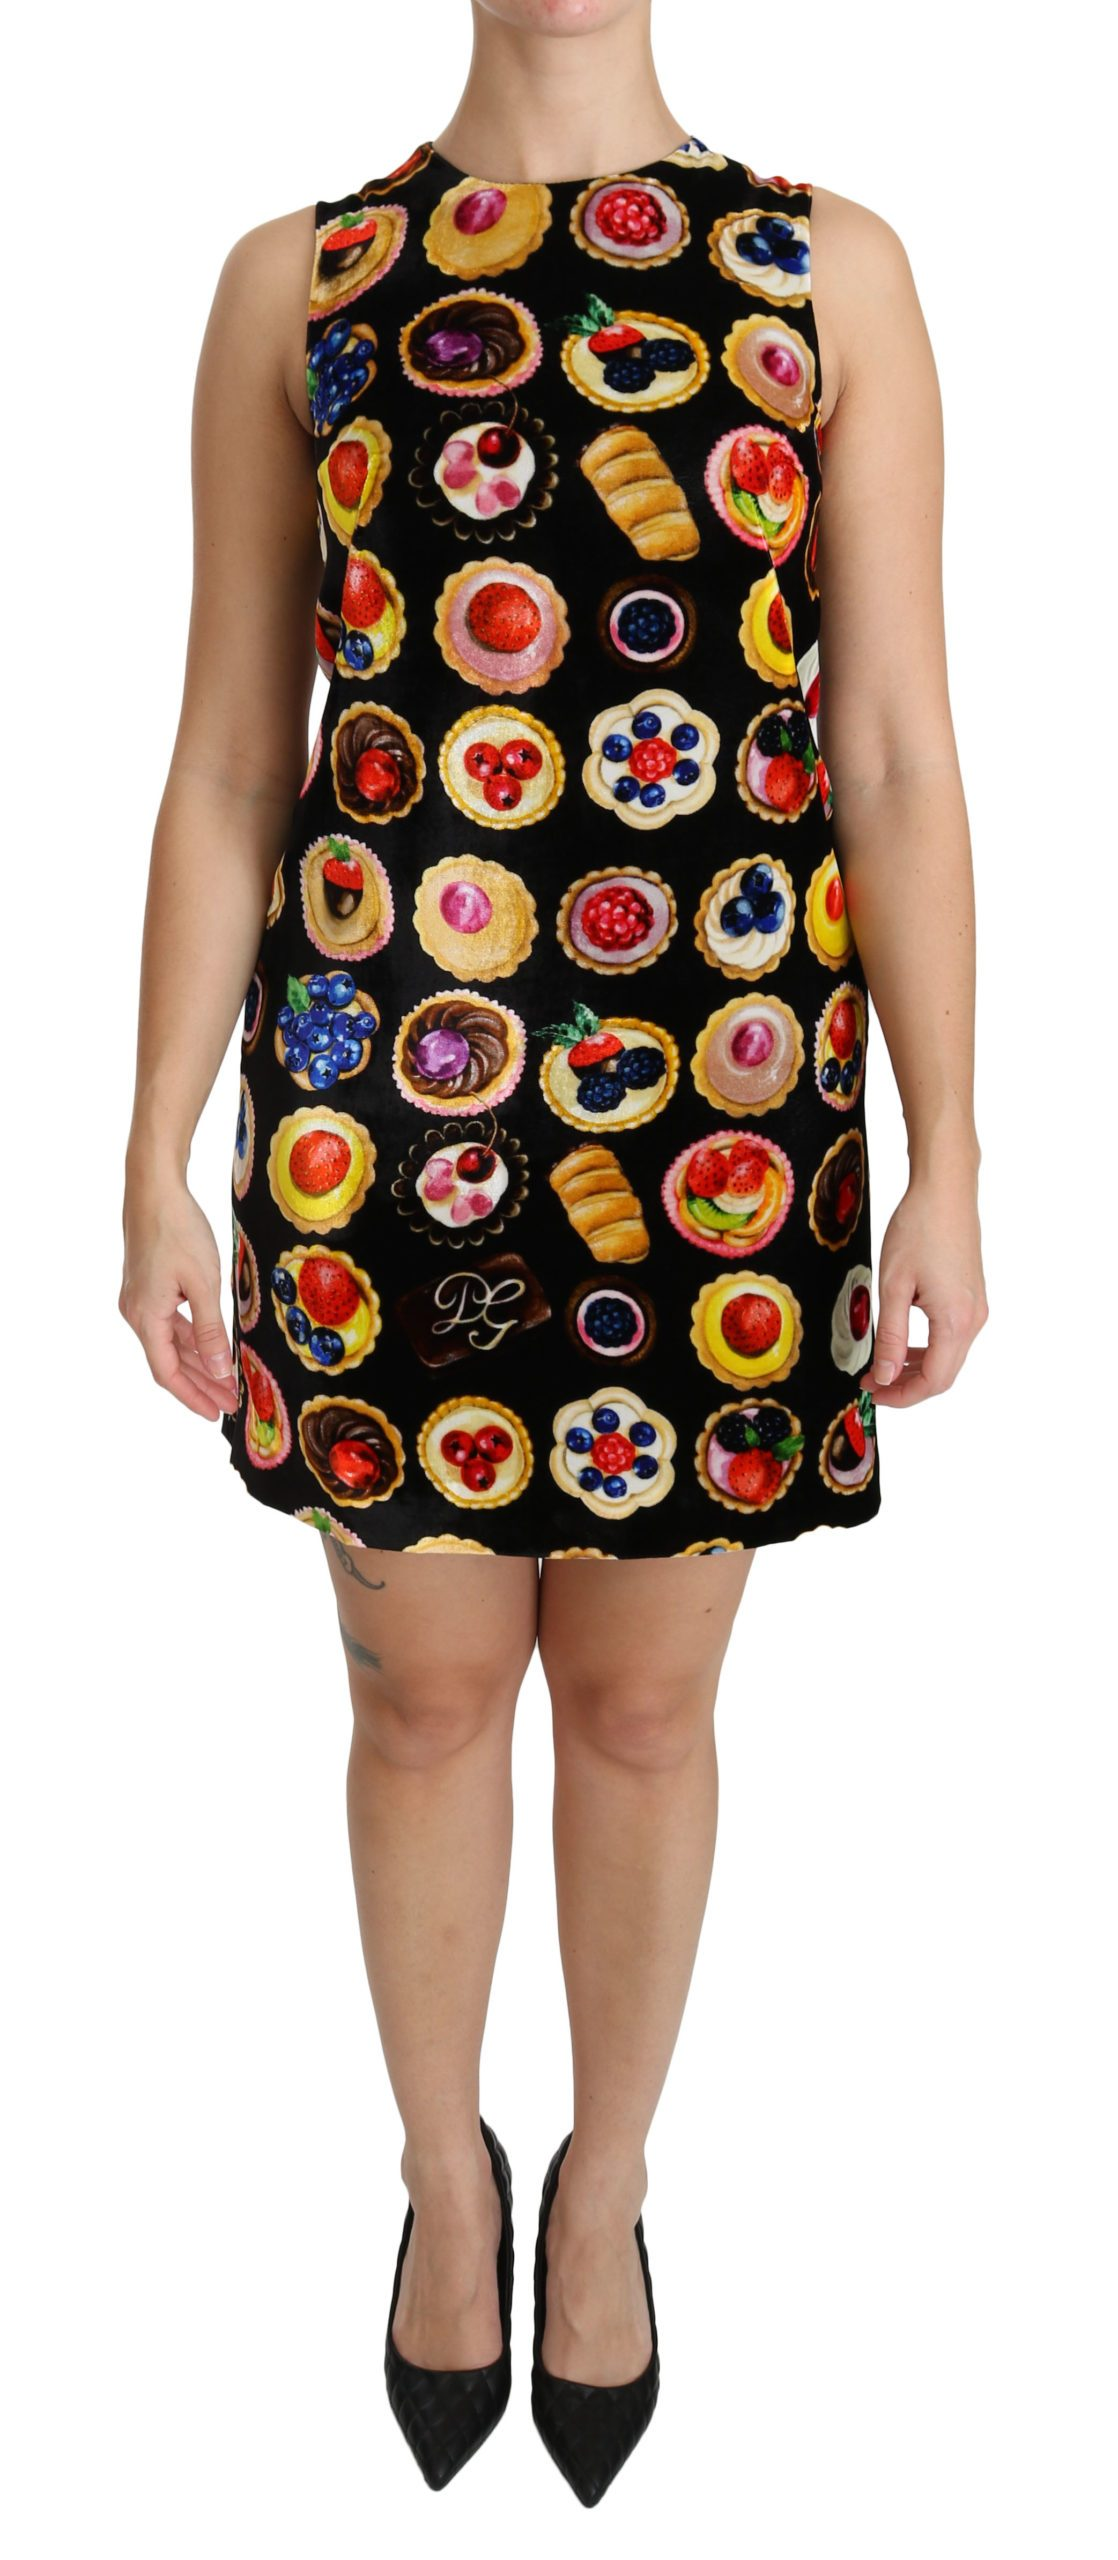 Dolce & Gabbana Women's Desserts Shift Mini Viscose Dress Black DR2144 - IT38 XS